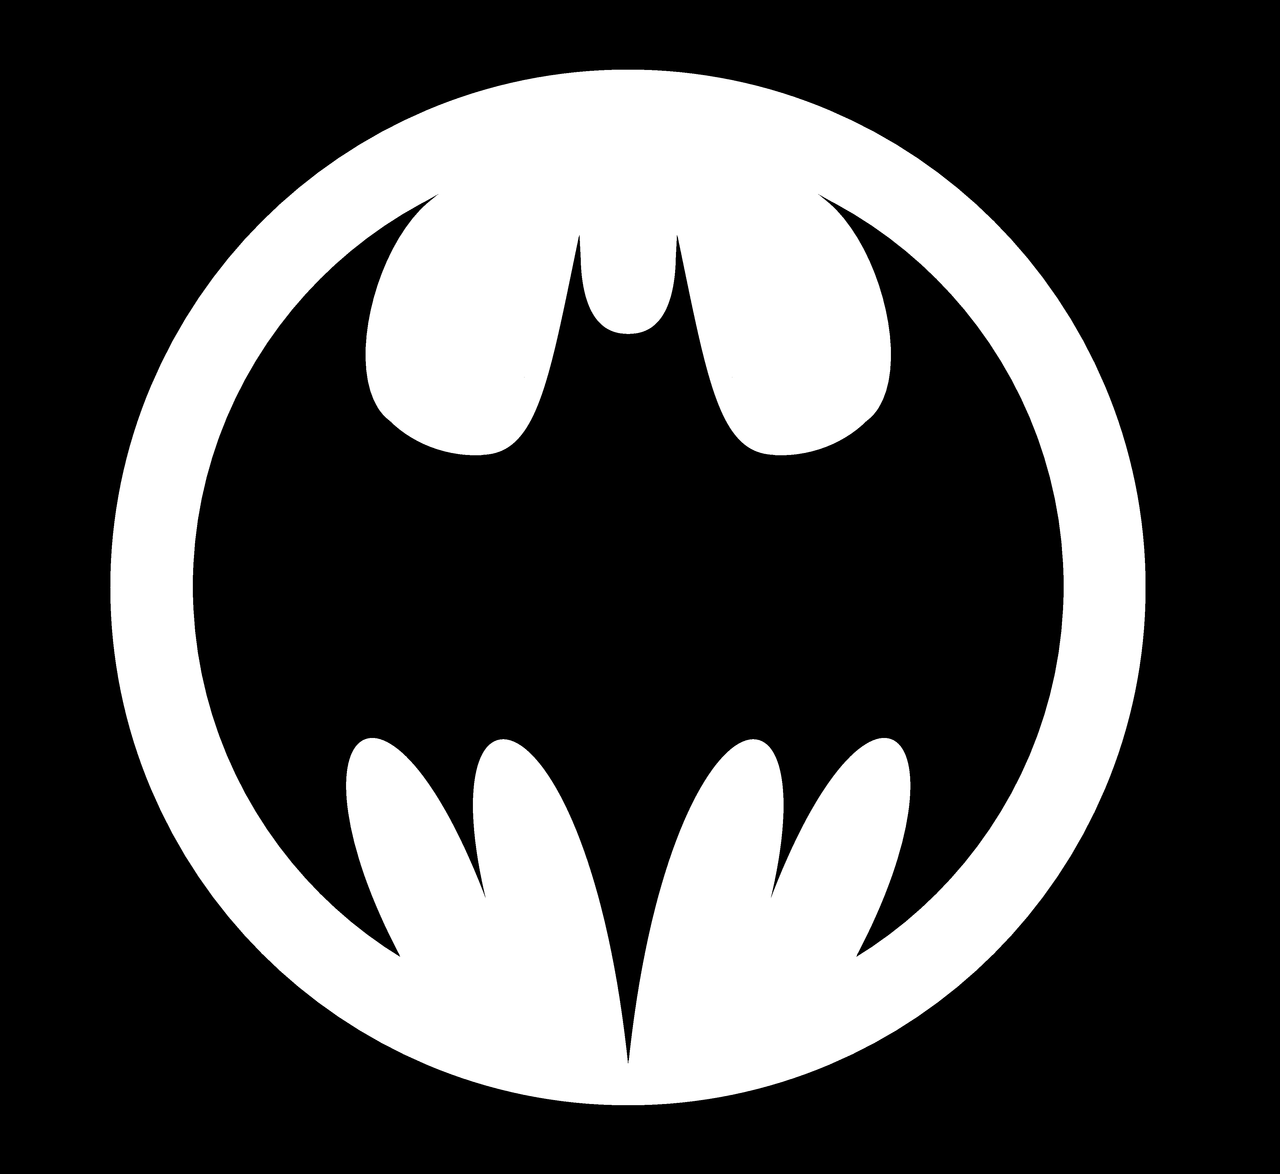 Http Fc08 Deviantart Net Fs70 I 2013 154 A 1 Batman Logo By Weylandyutaniassoc D67qq4s Png Batman Logo Batman Symbol Batman